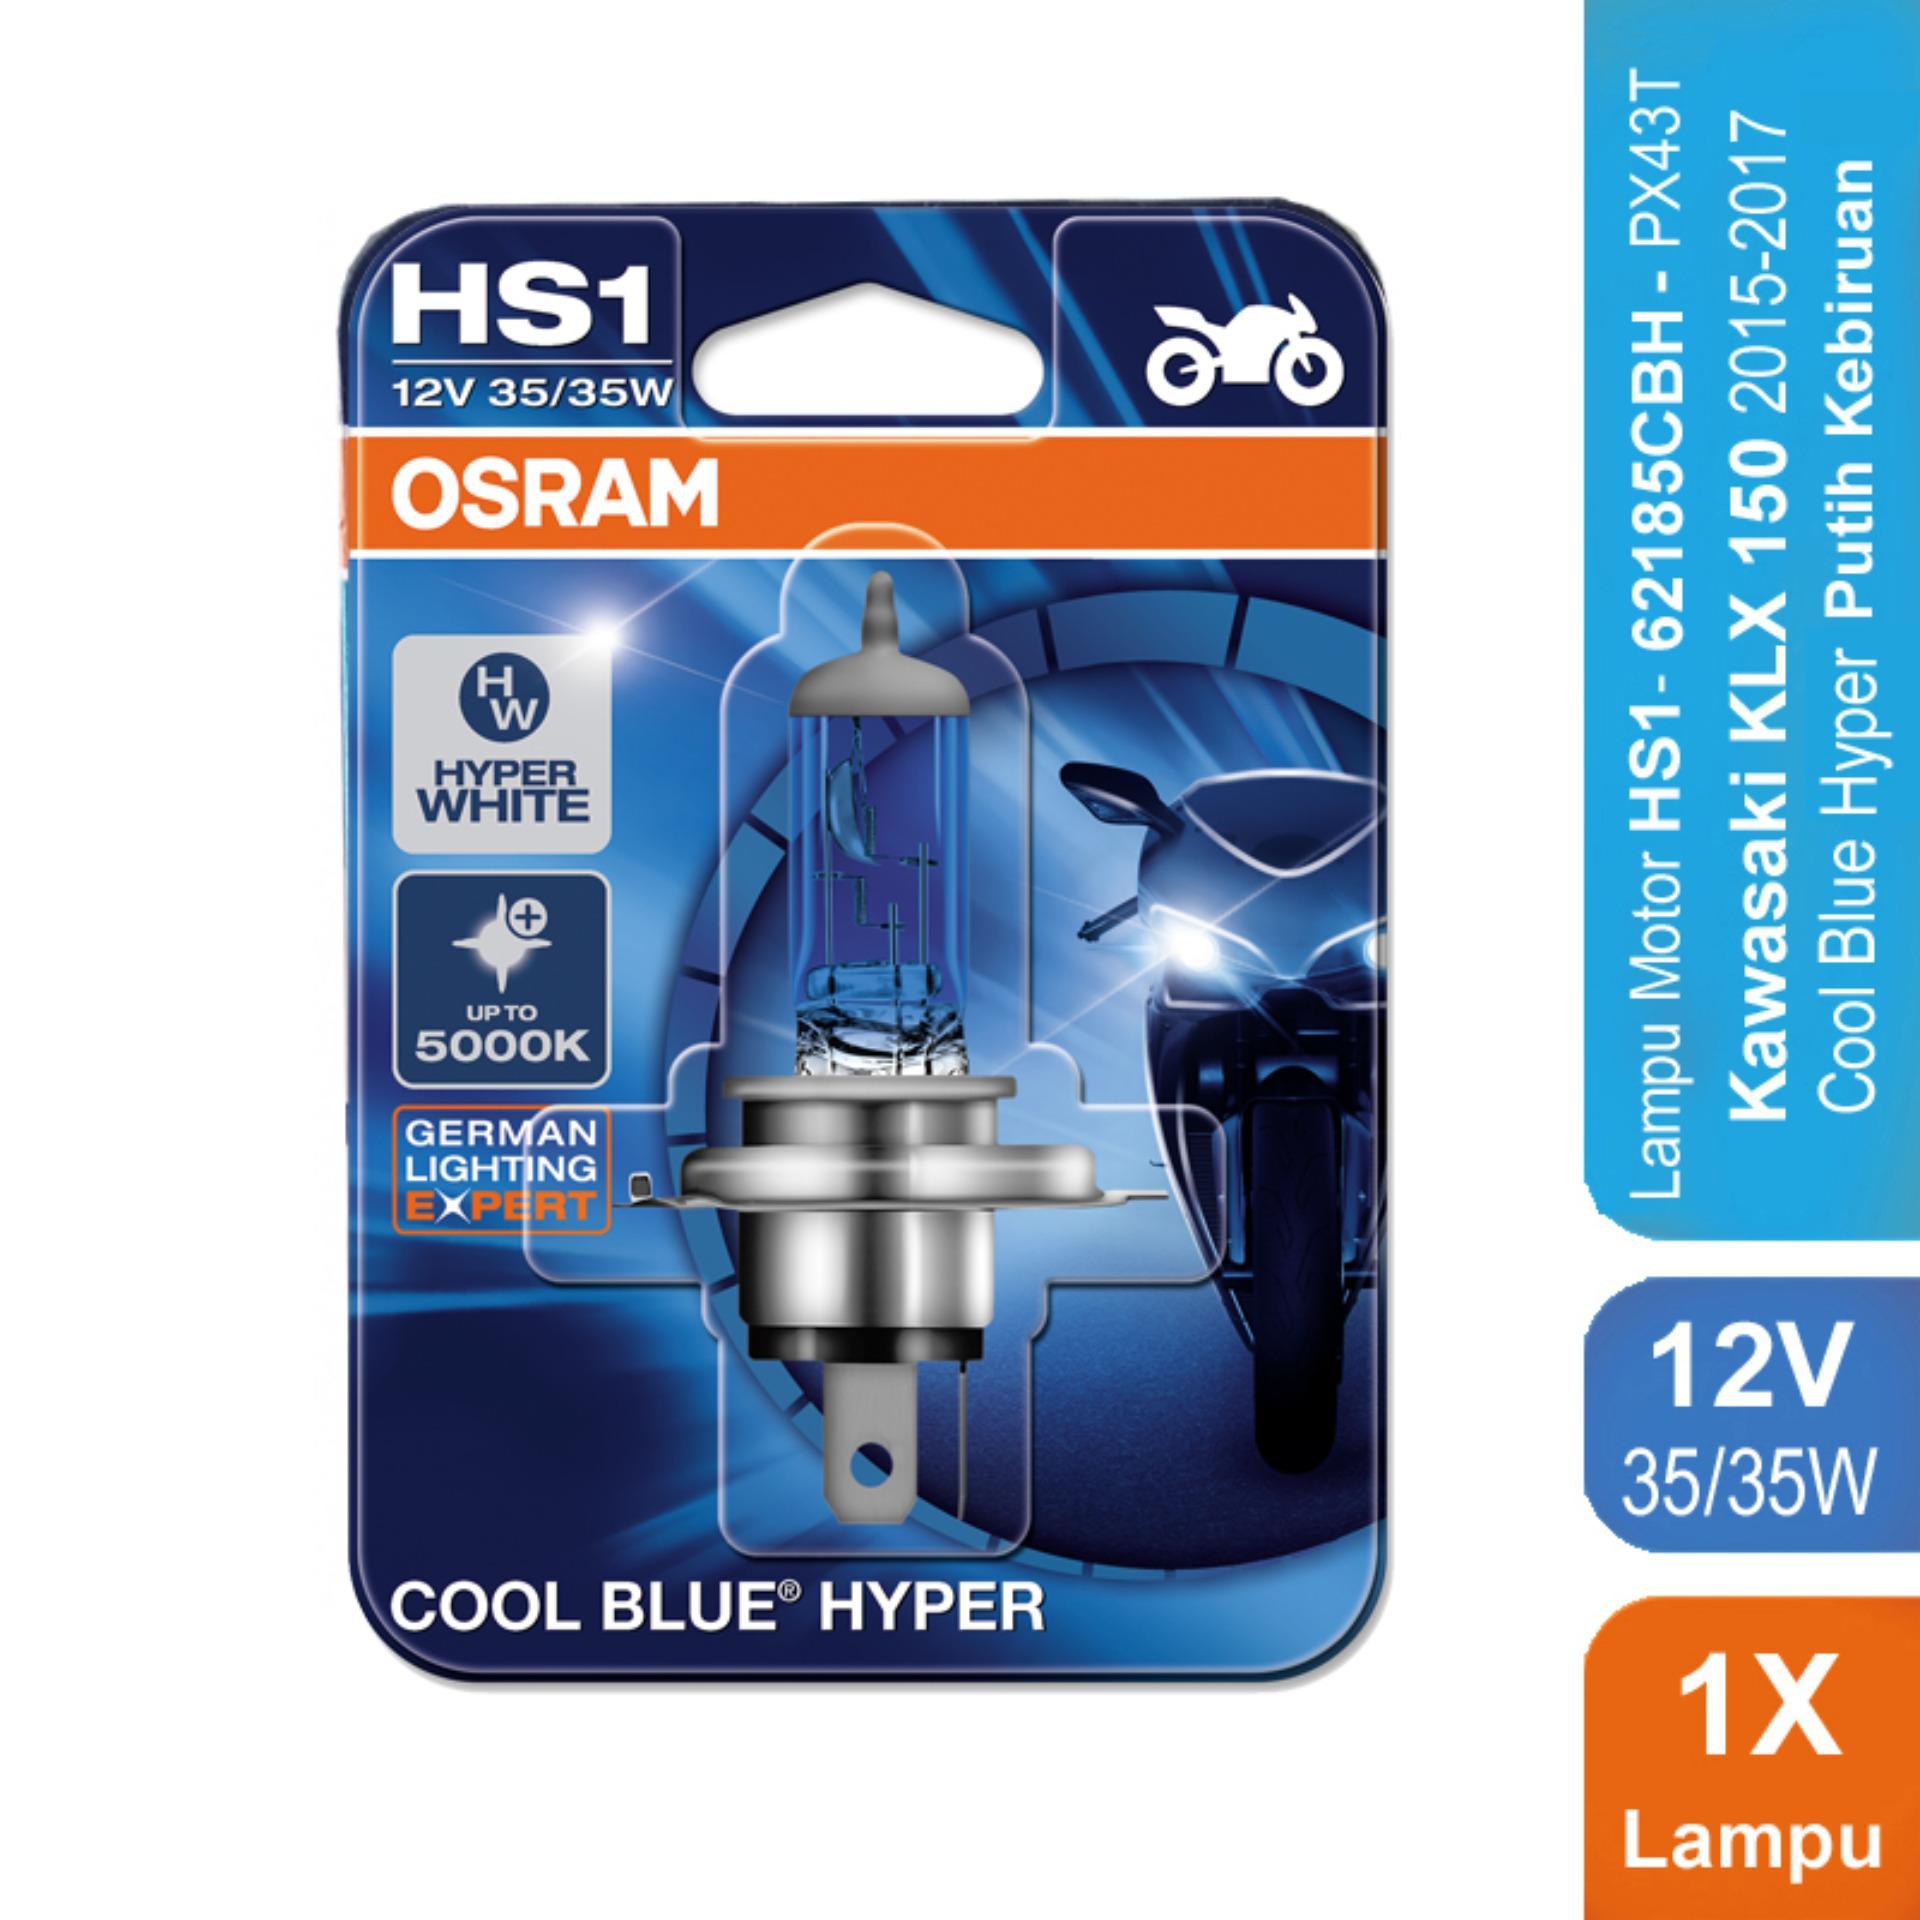 Osram Lampu Motor Kawasaki KLX 150 2015-2017 - HS1 62185CBH 12V 35/35 - Cool Blue Hyper